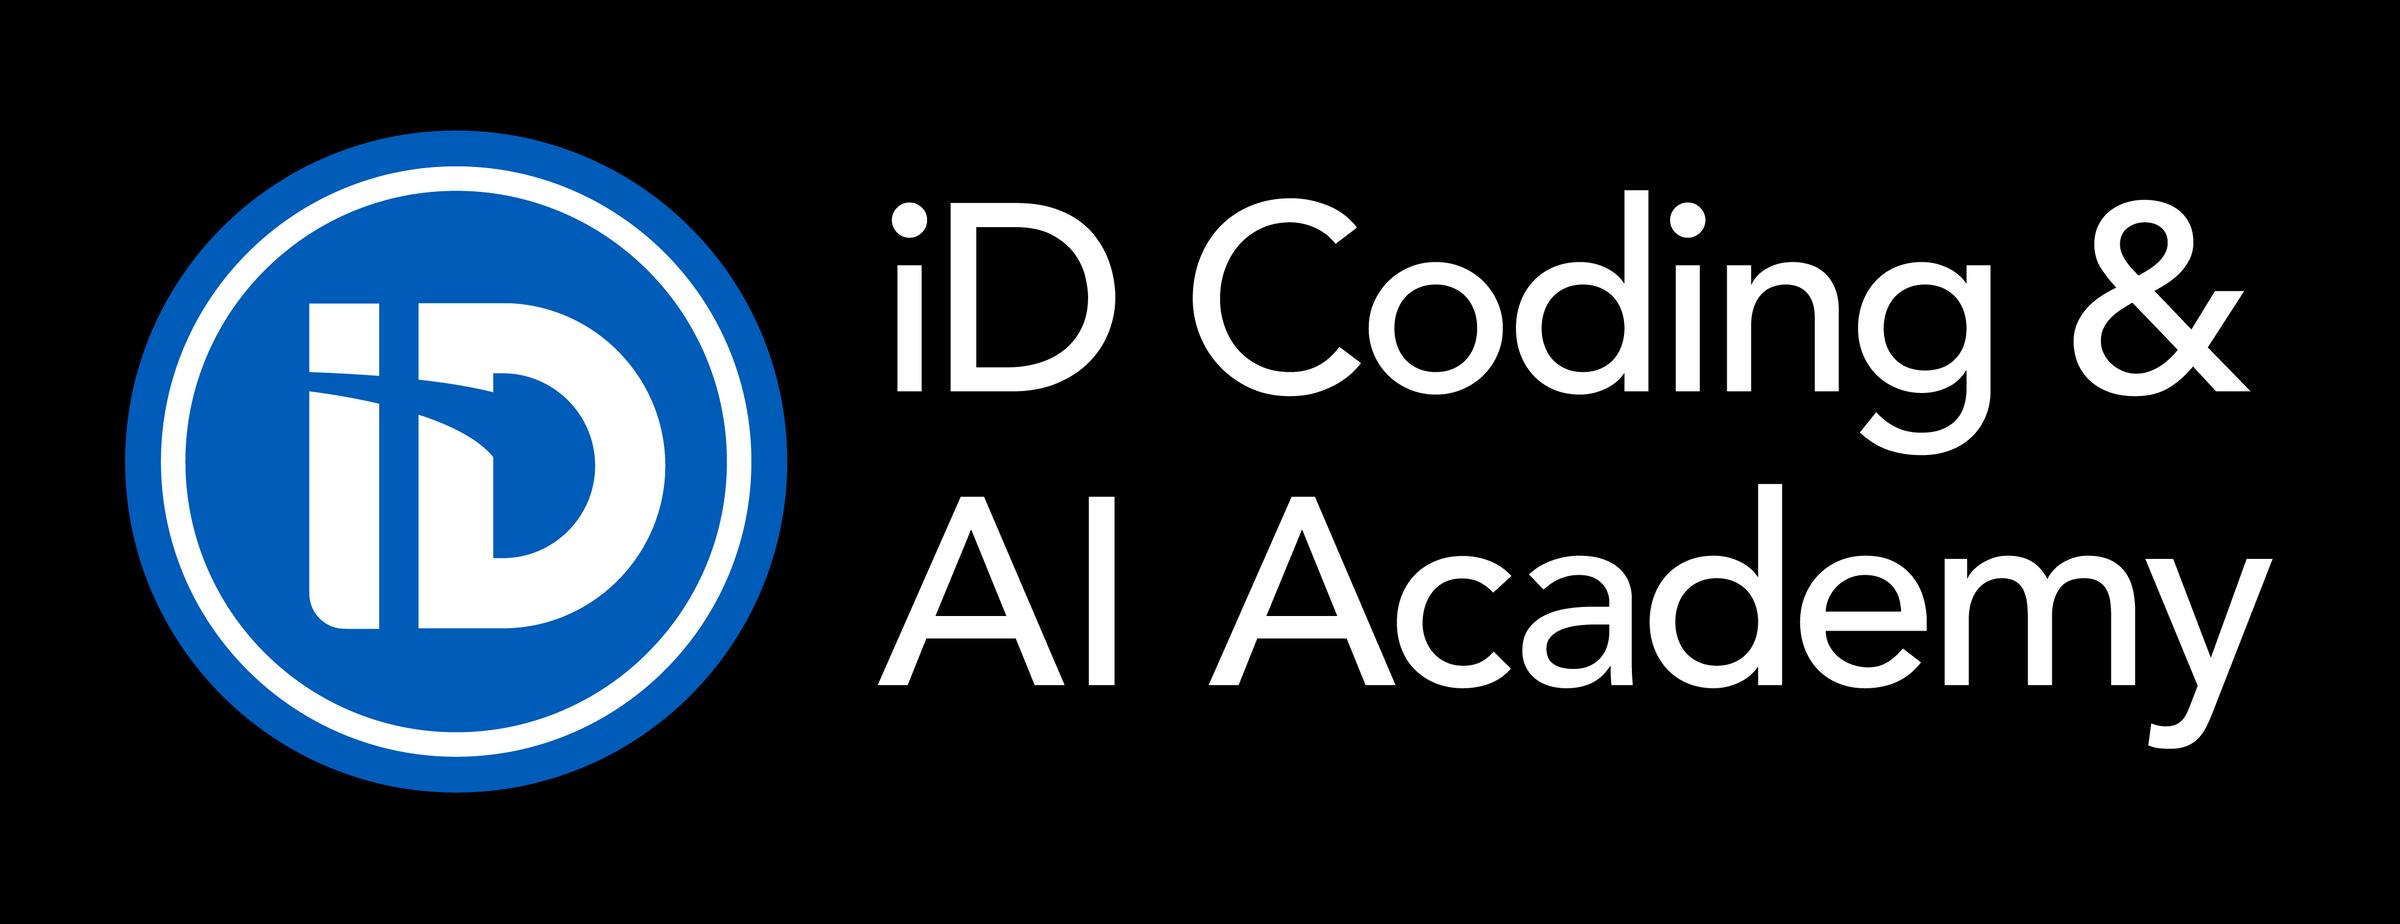 iD Coding & AI Academy for Teens - Held at Villanova University